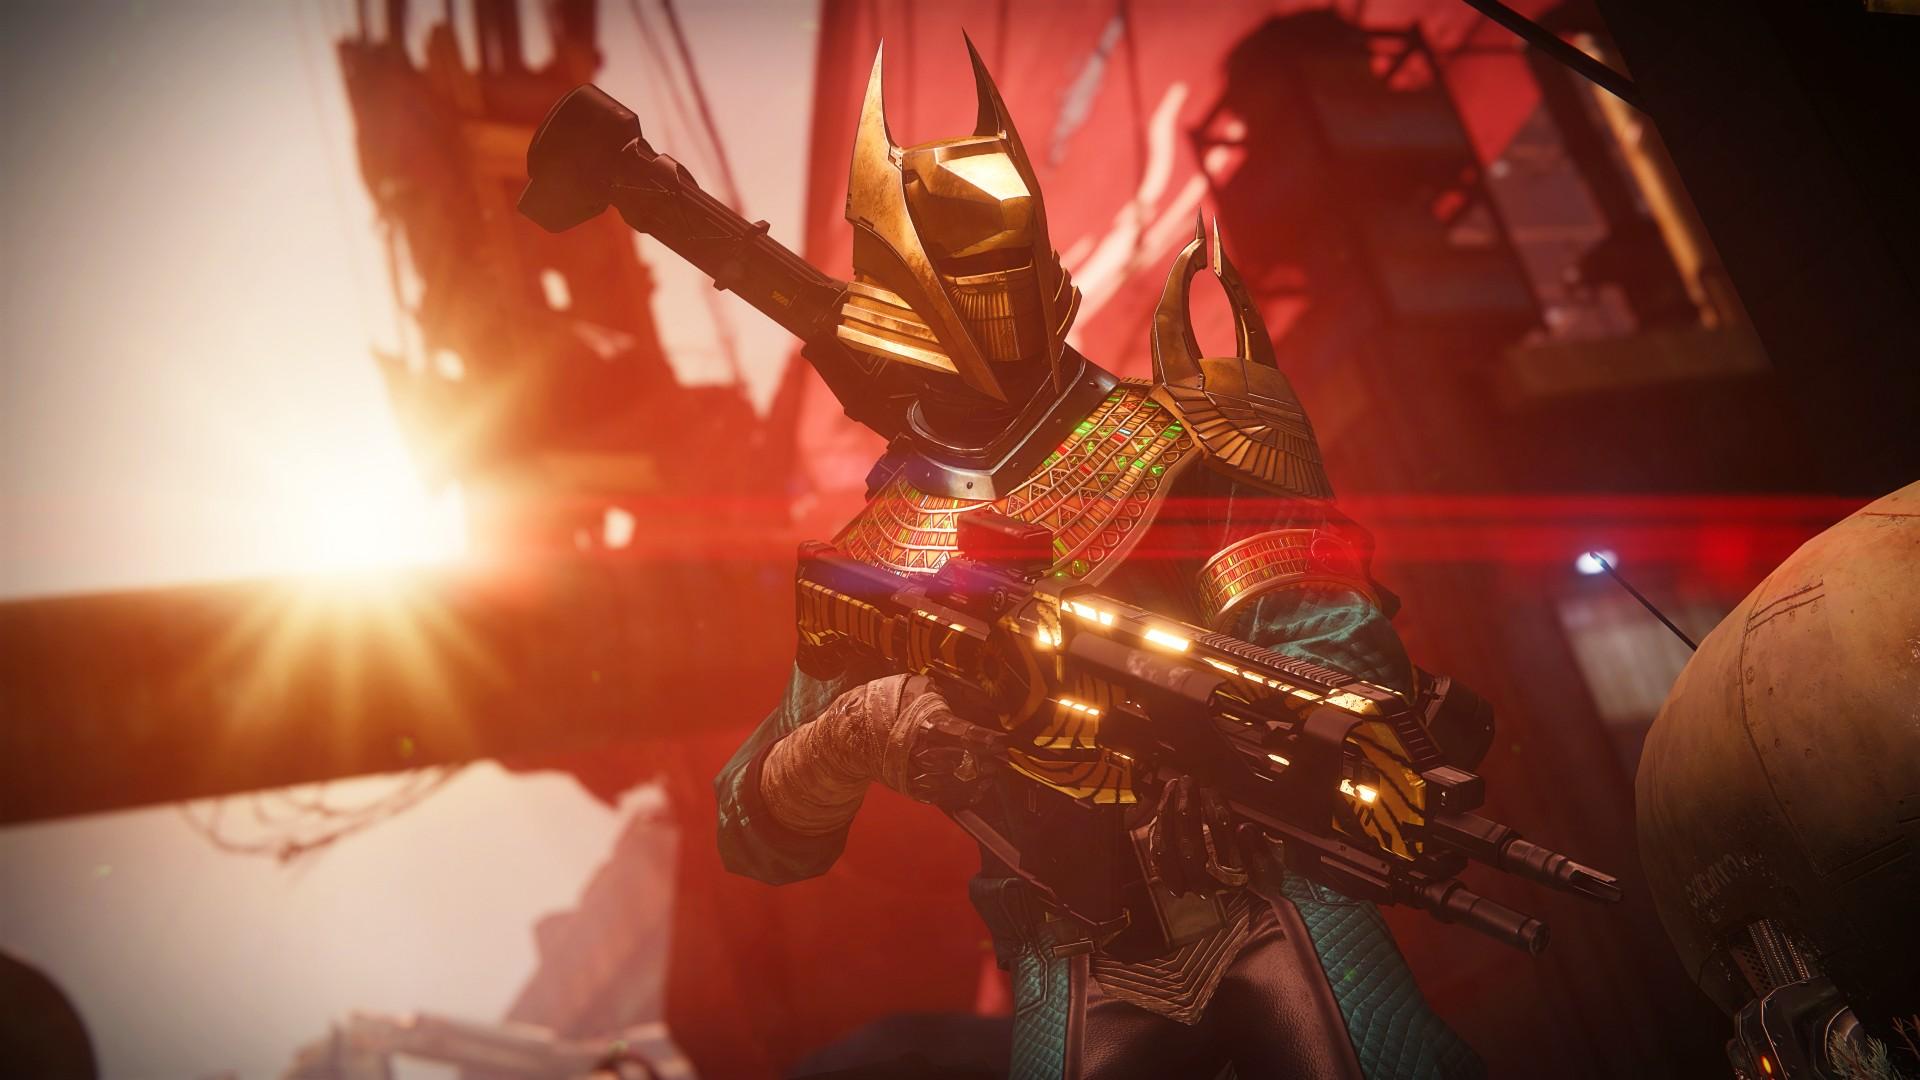 Destiny 2's Trials of Osiris disabled after players use Hakke emblems to match fix